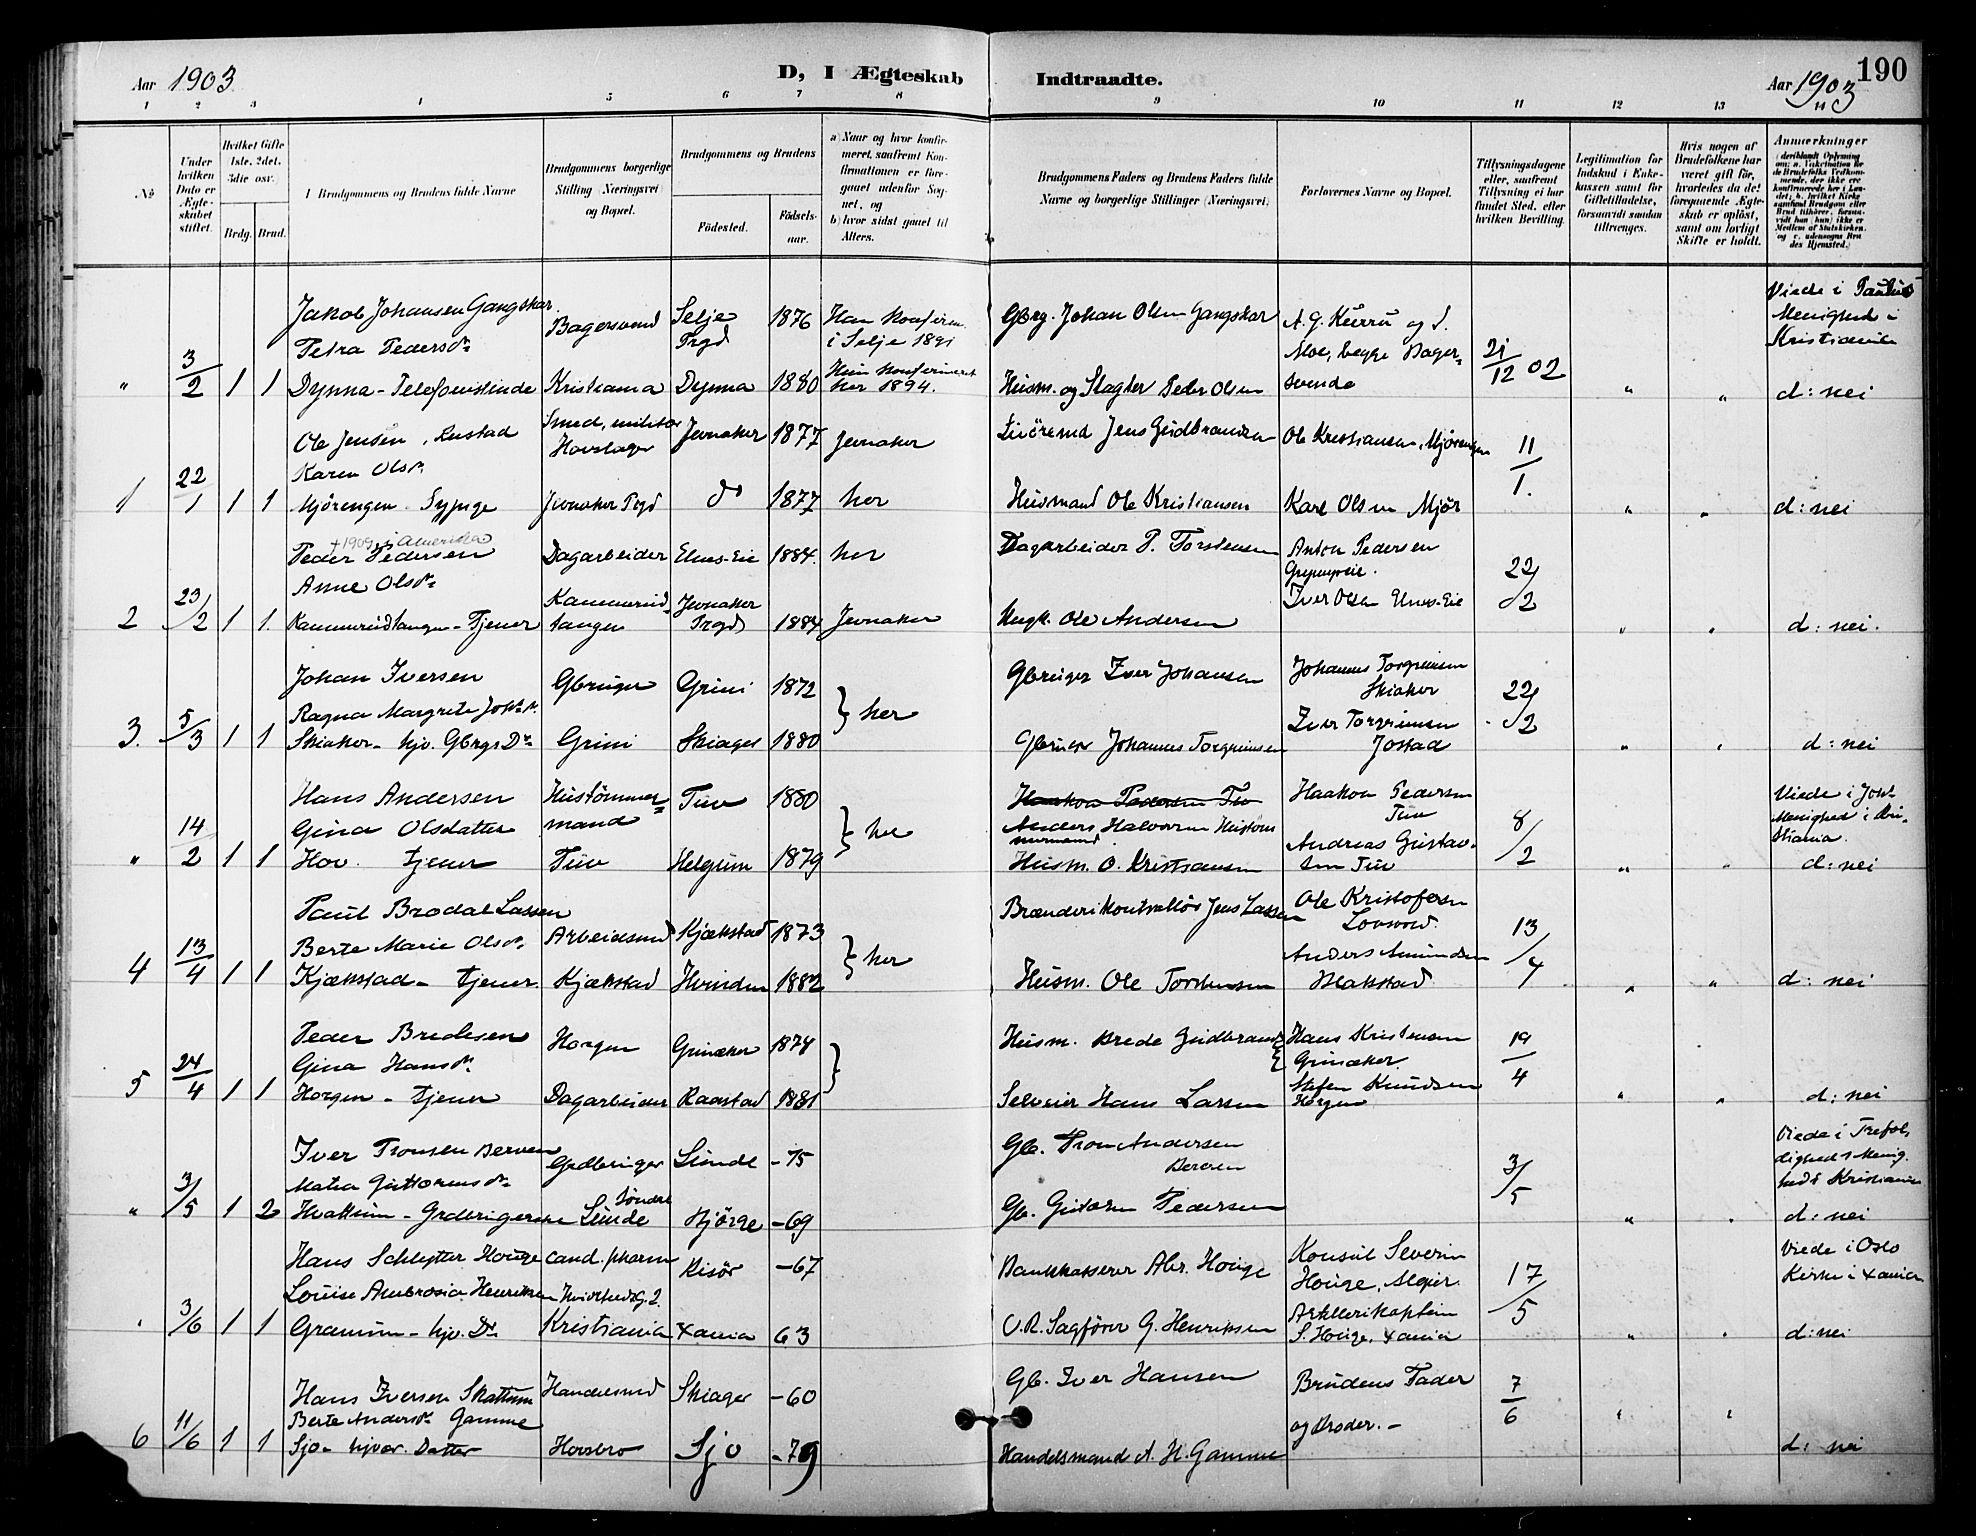 SAH, Gran prestekontor, Ministerialbok nr. 19, 1898-1907, s. 190